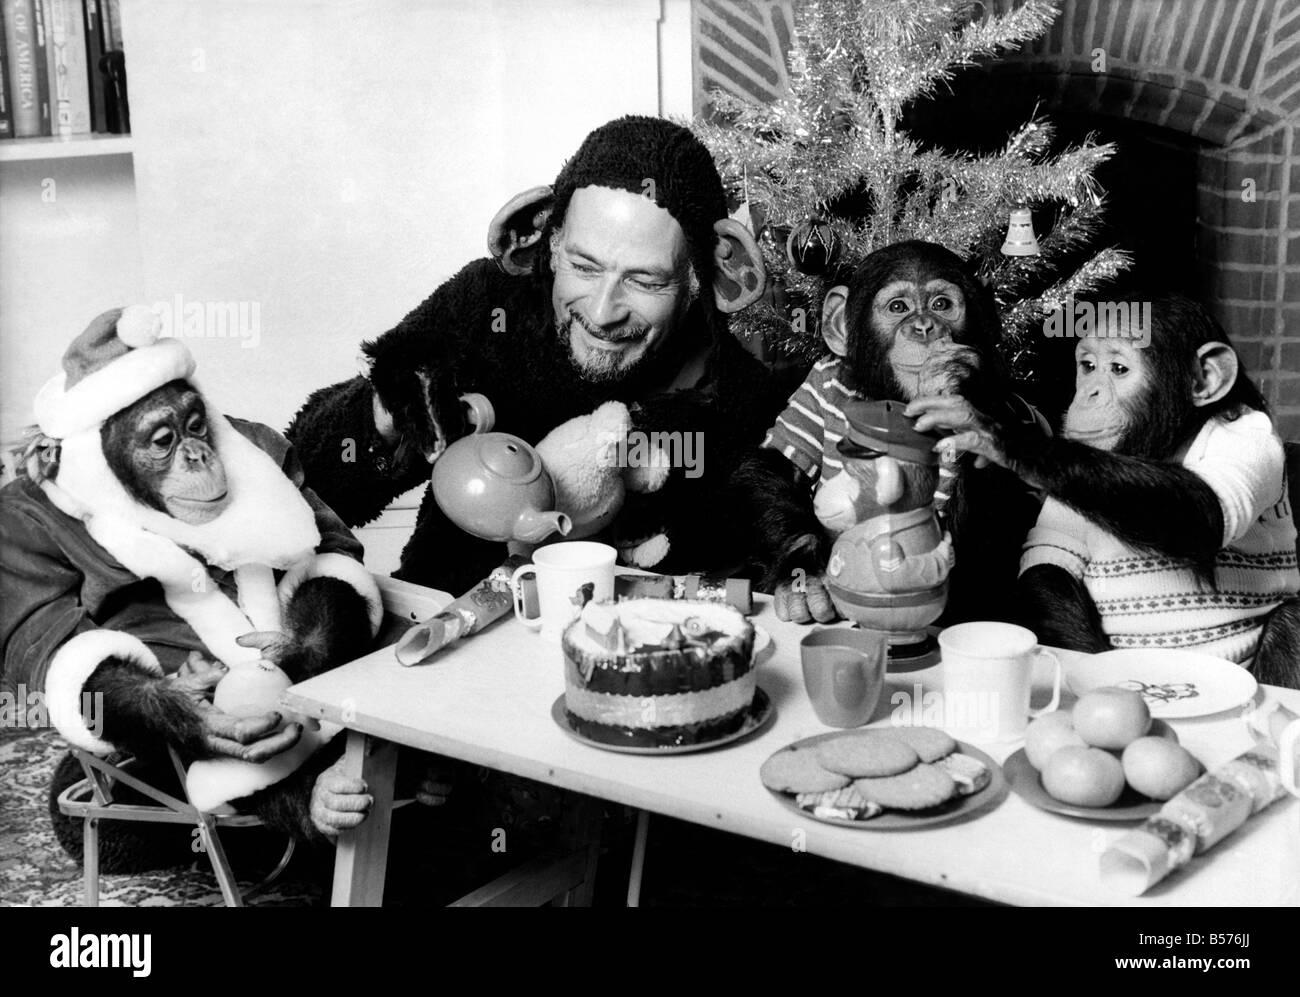 Chimpanzee Christmas party December 1978 P004075 - Stock Image